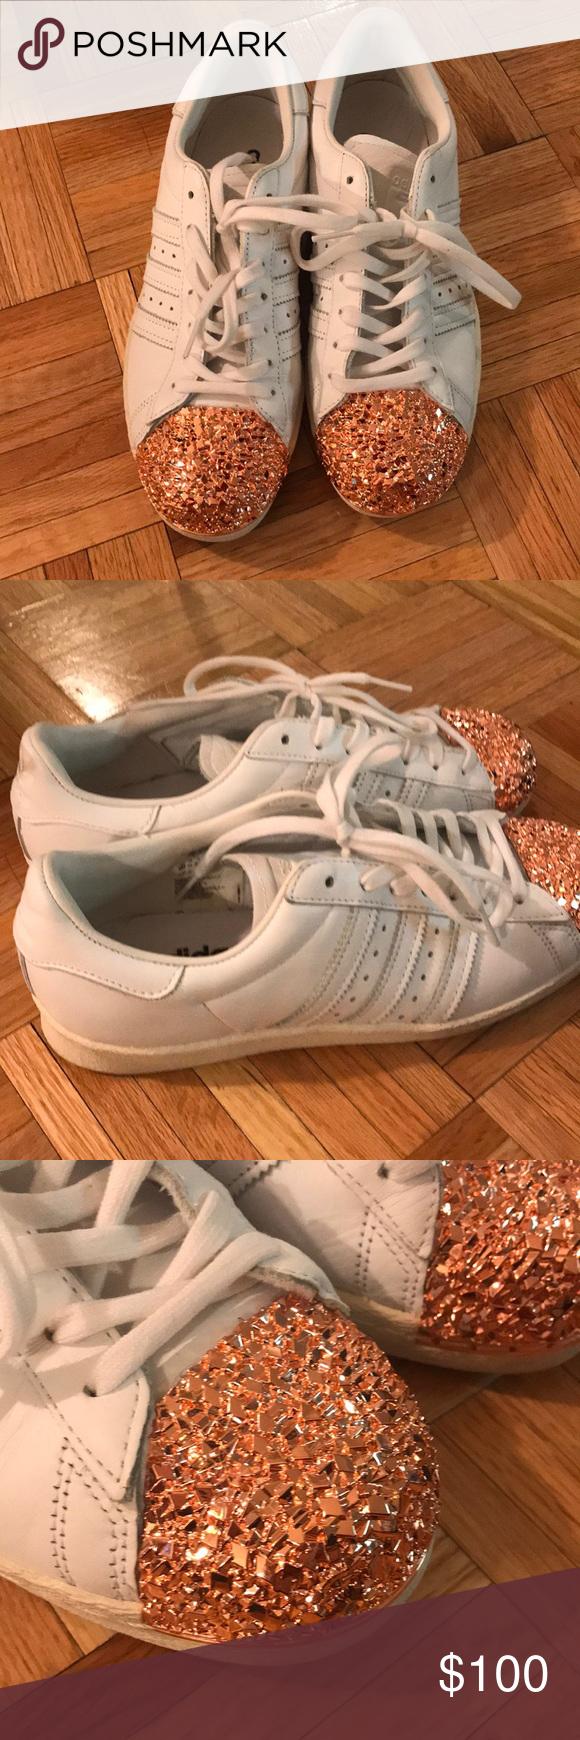 Adidas rare superstars rose gold toe size 9 These adidas